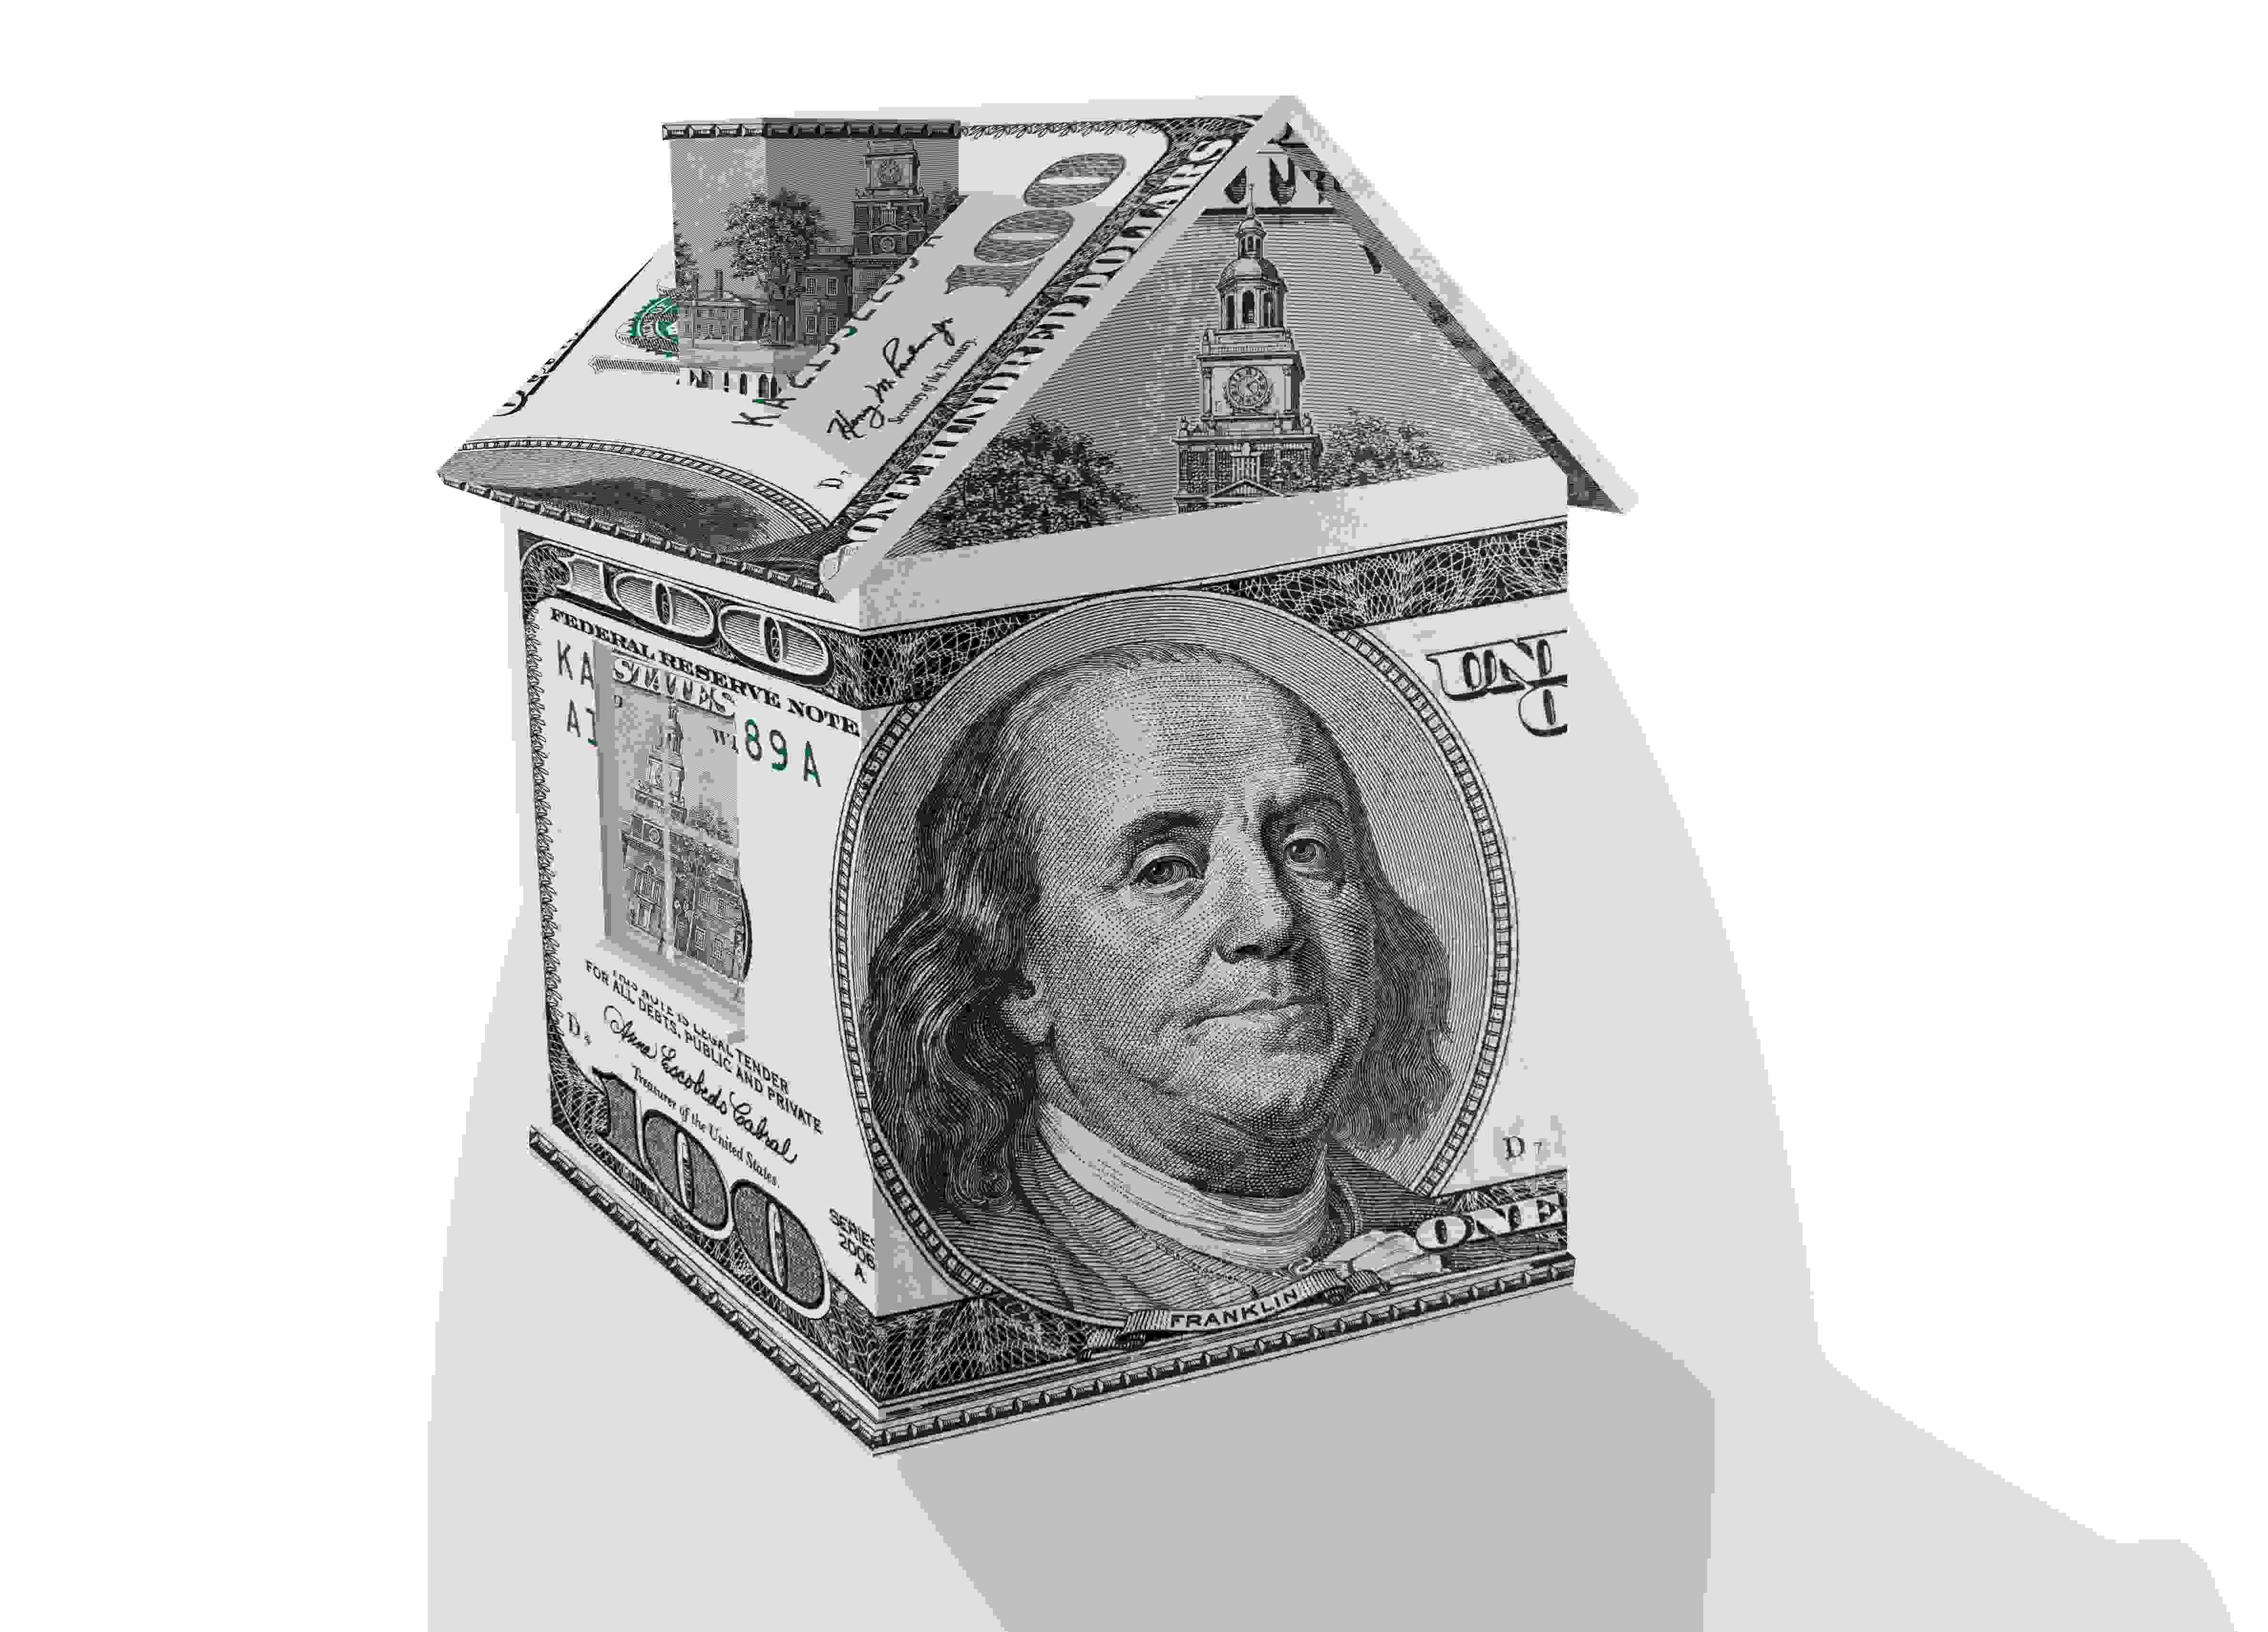 ivs evs - stime immobiliari - valutazioni- studiopcg - pezzoli e carniani - geometri in firenze